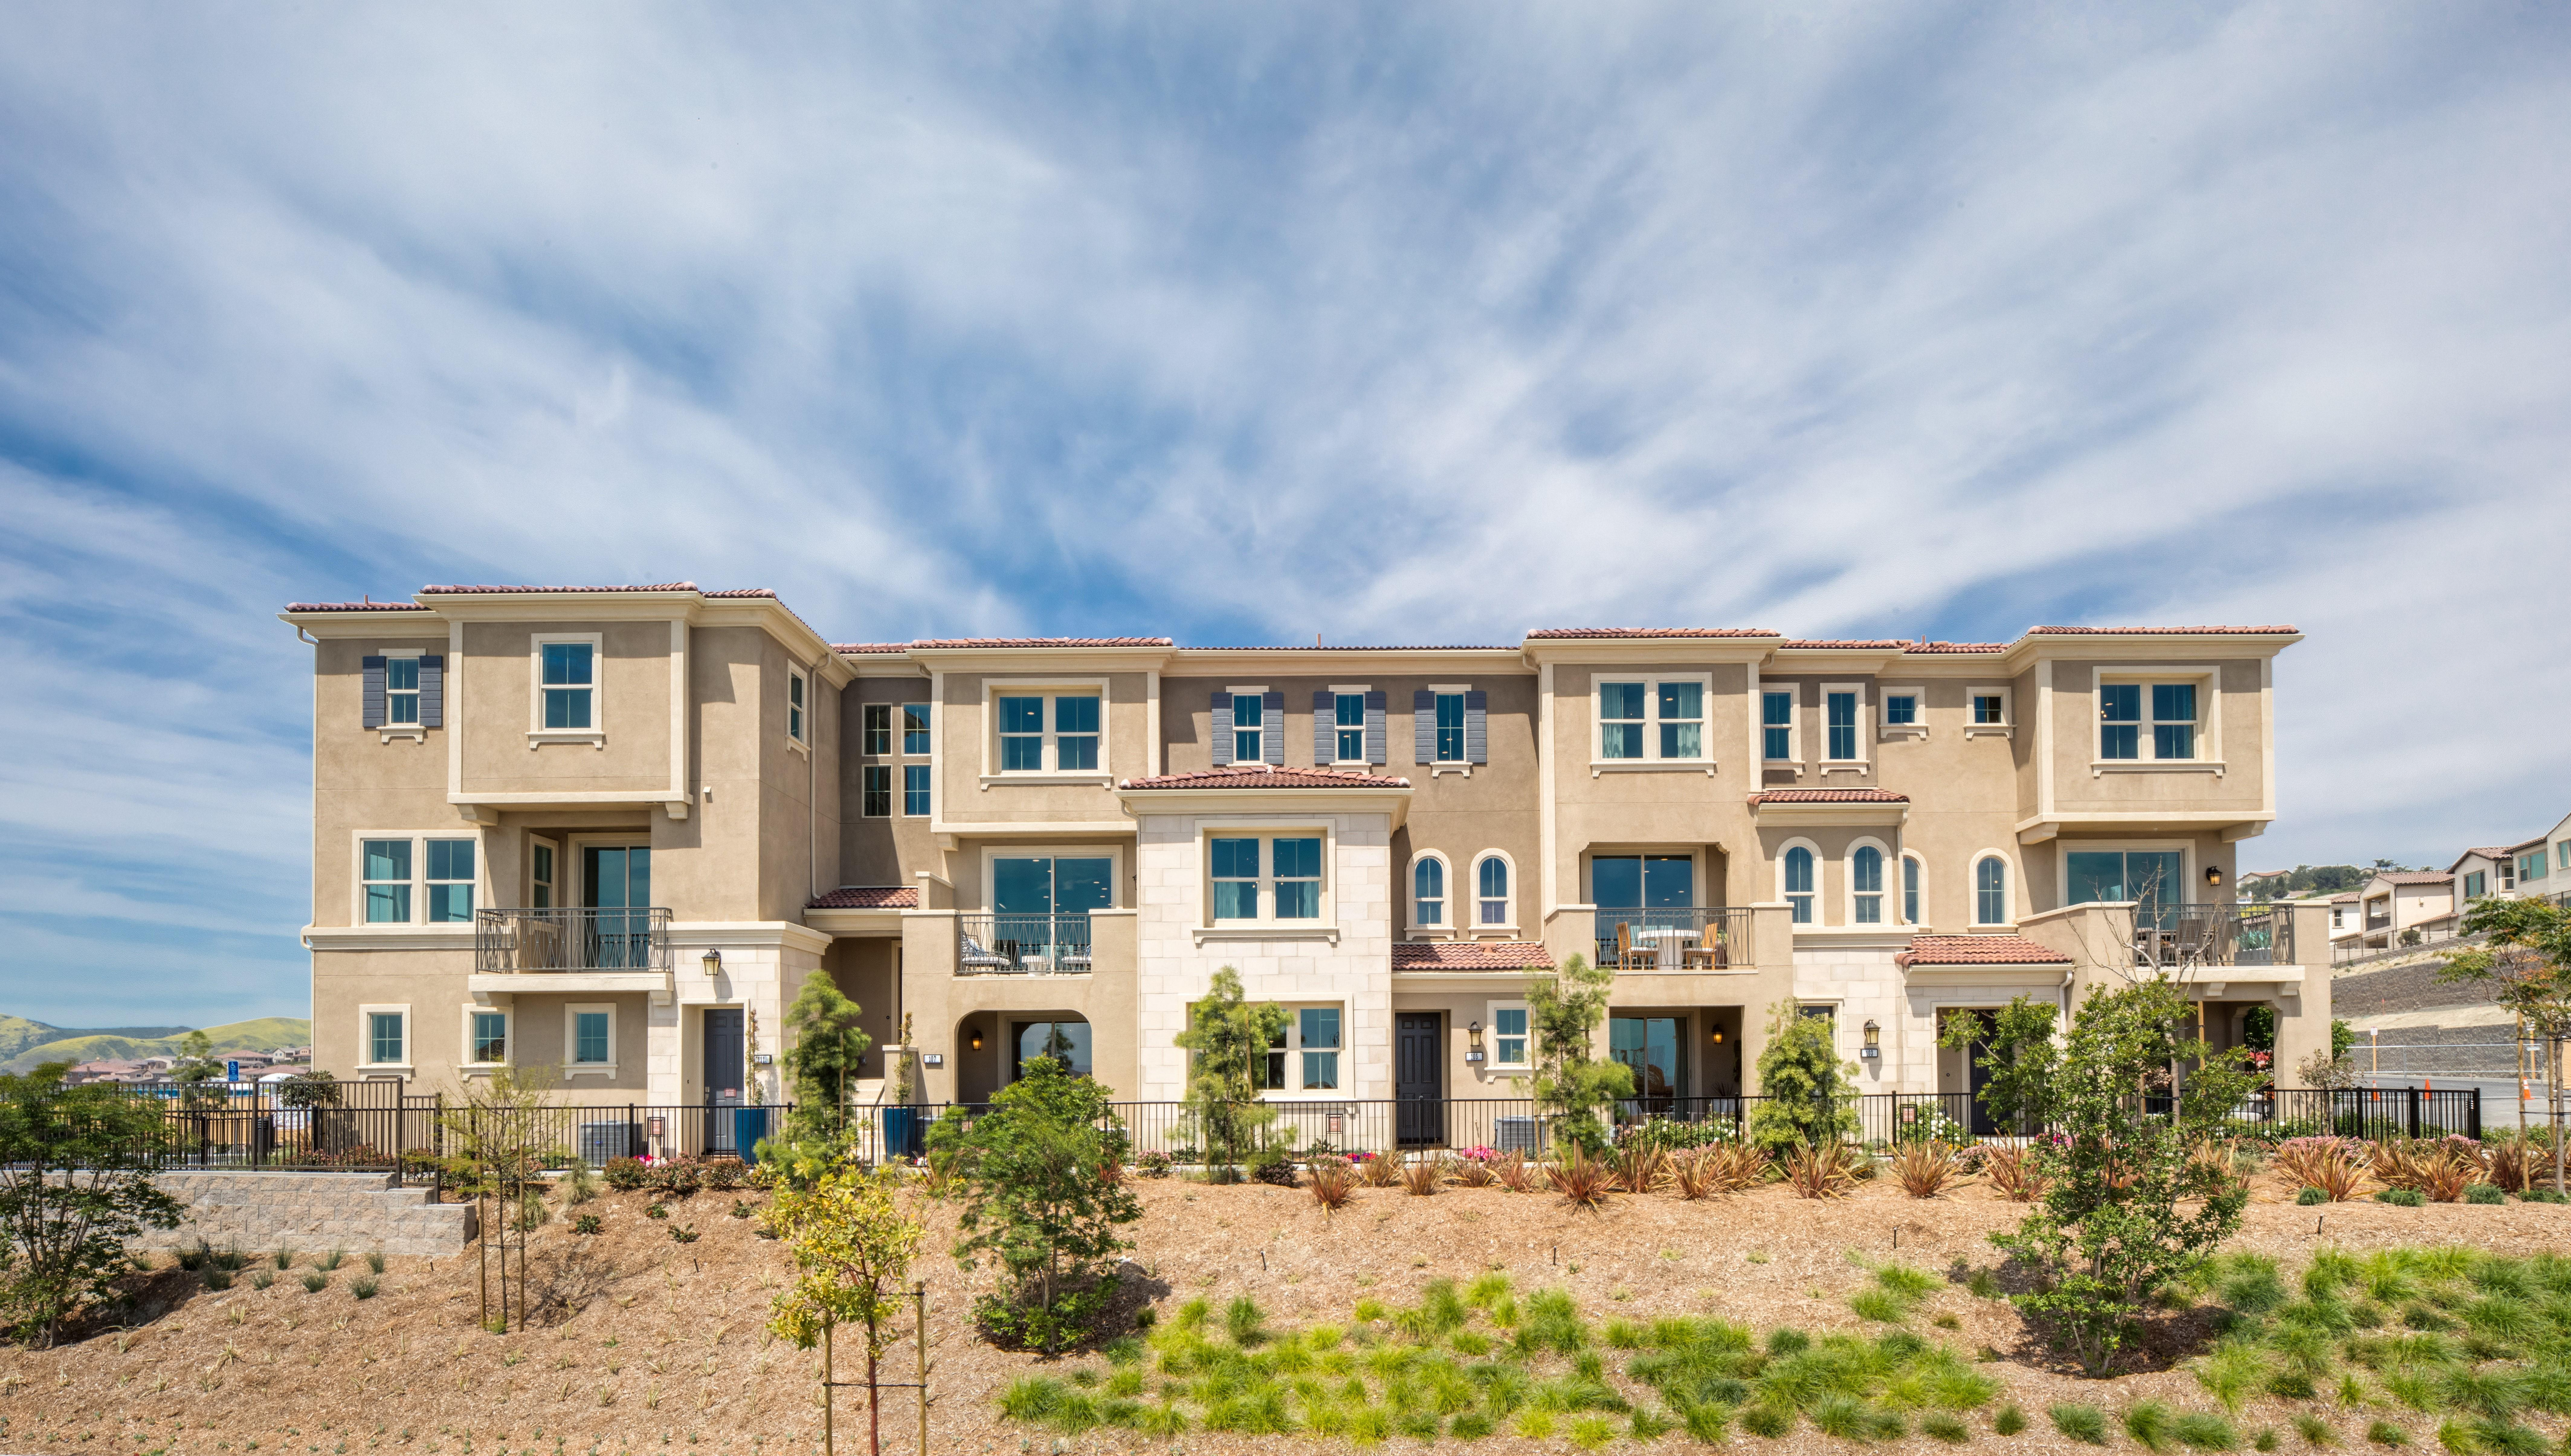 'Copperleaf at IronRidge' by Landsea Homes - SoCal in Orange County